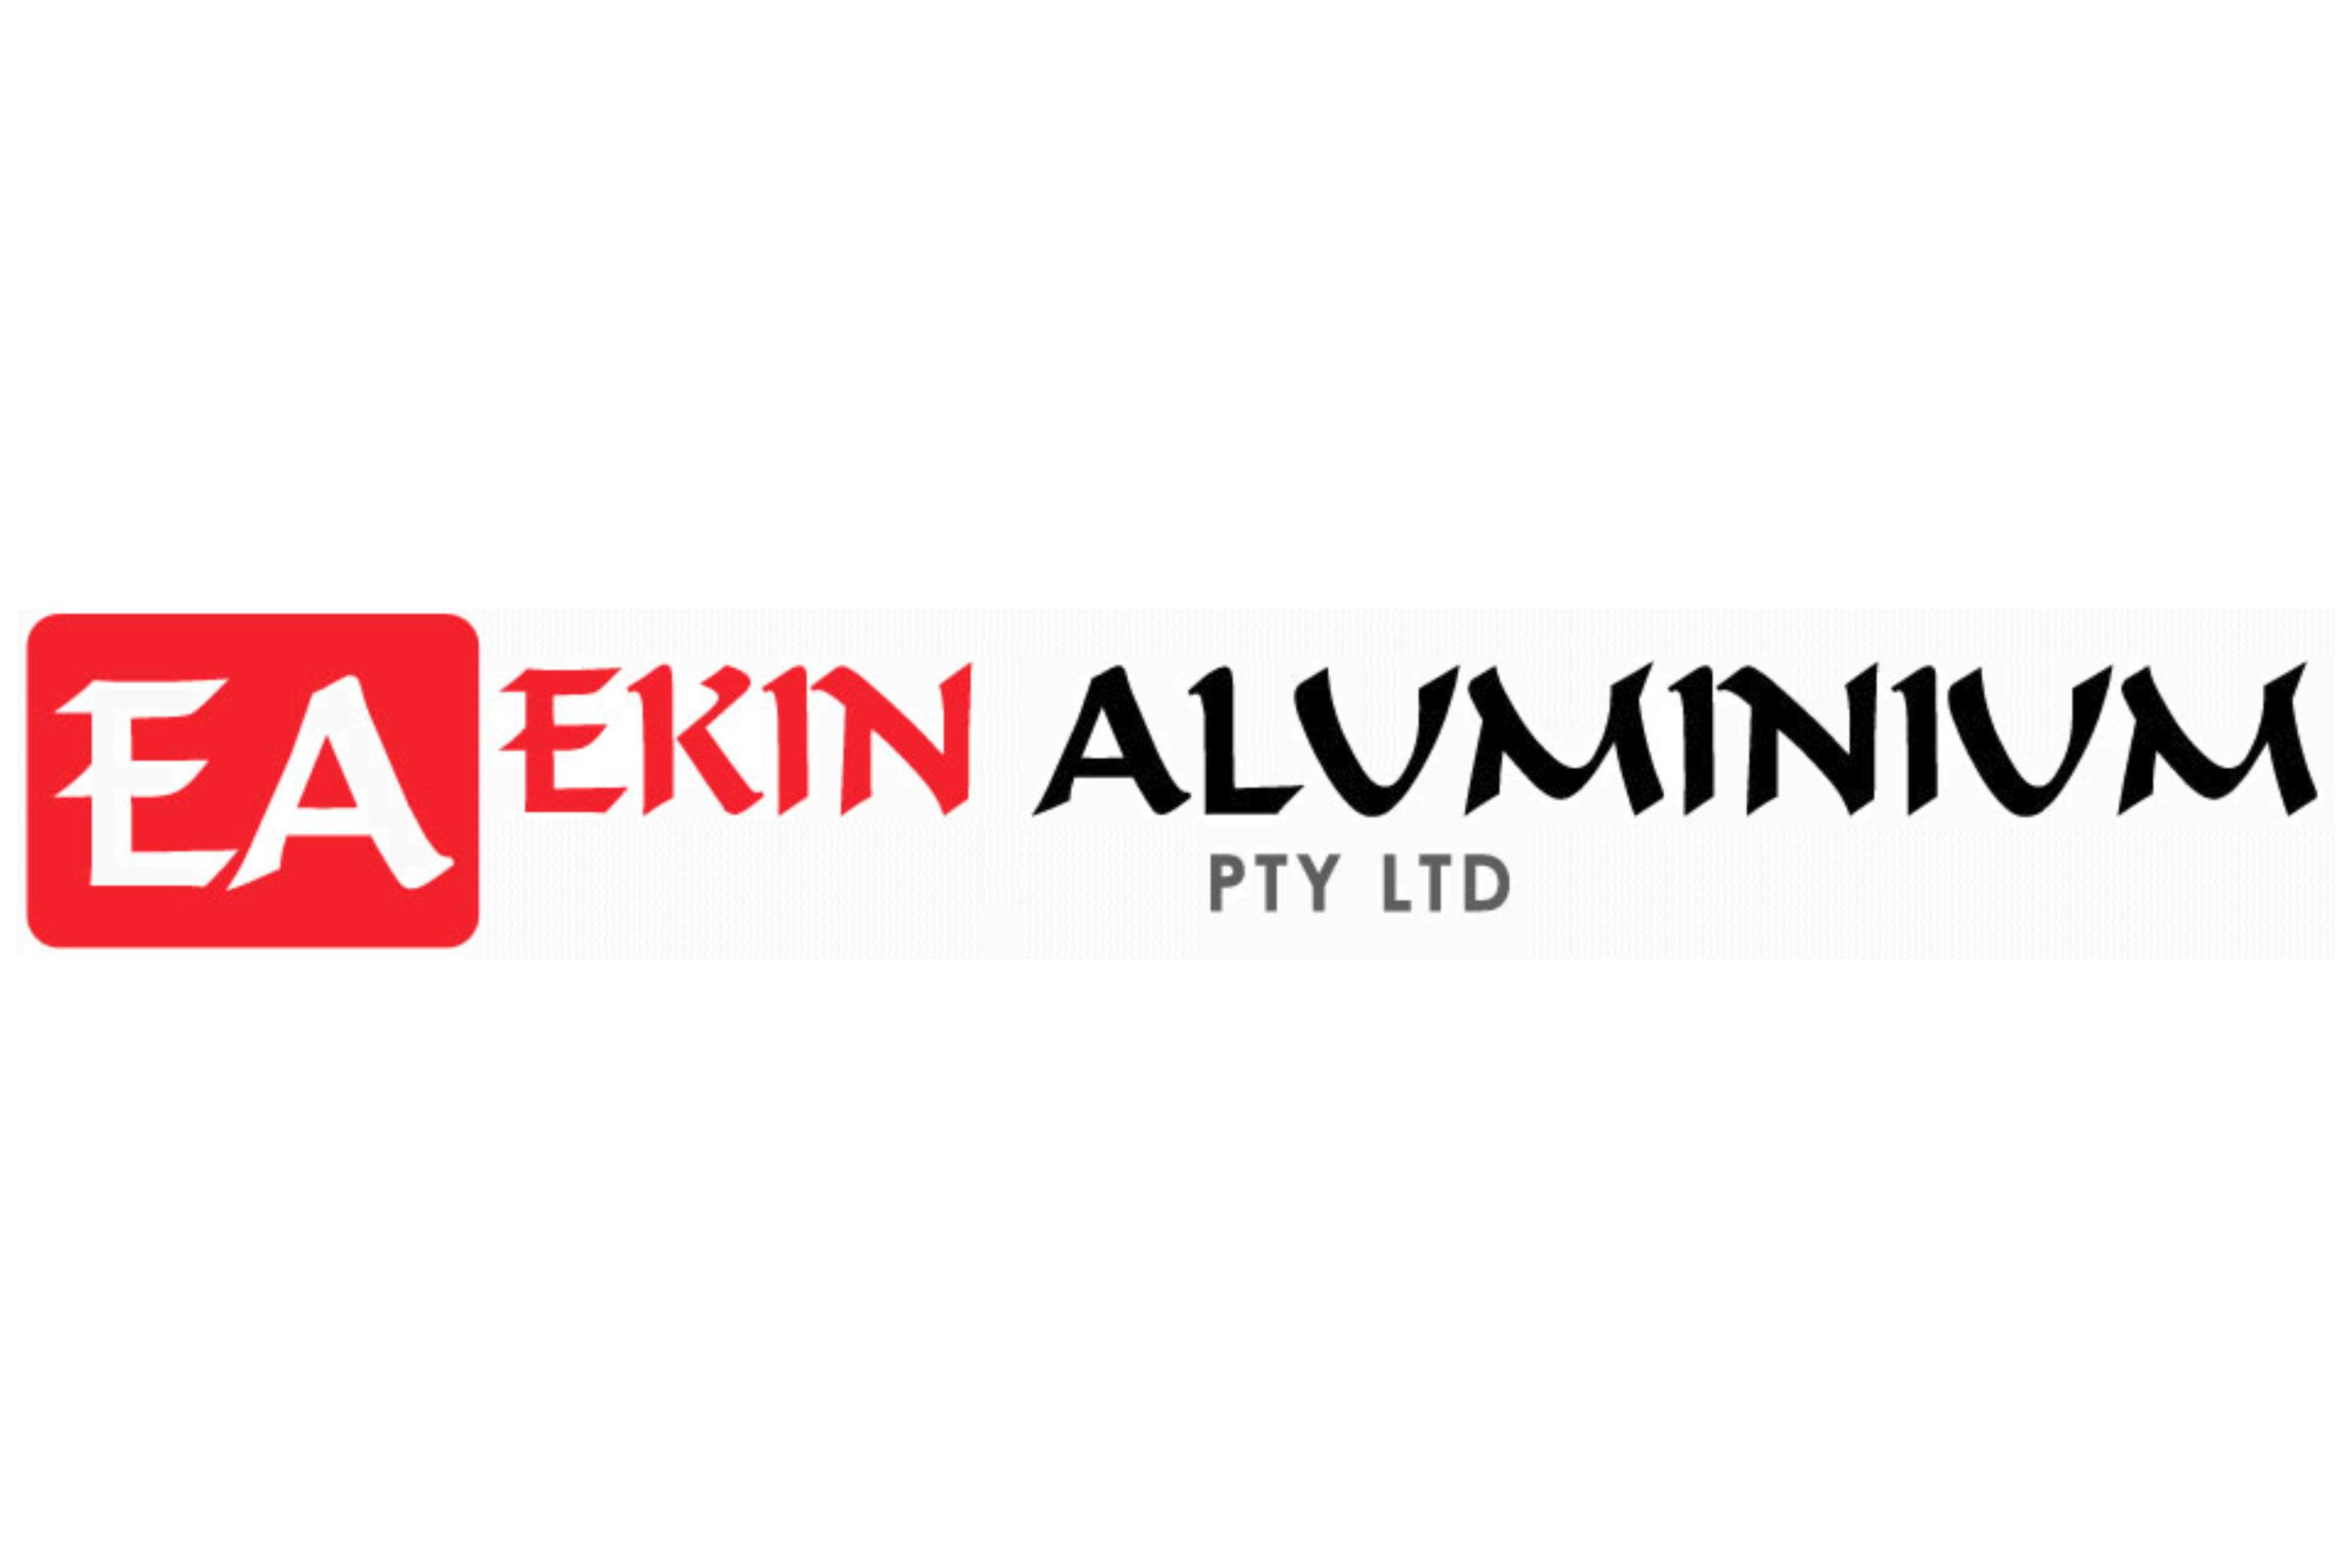 Ekin Aluminium